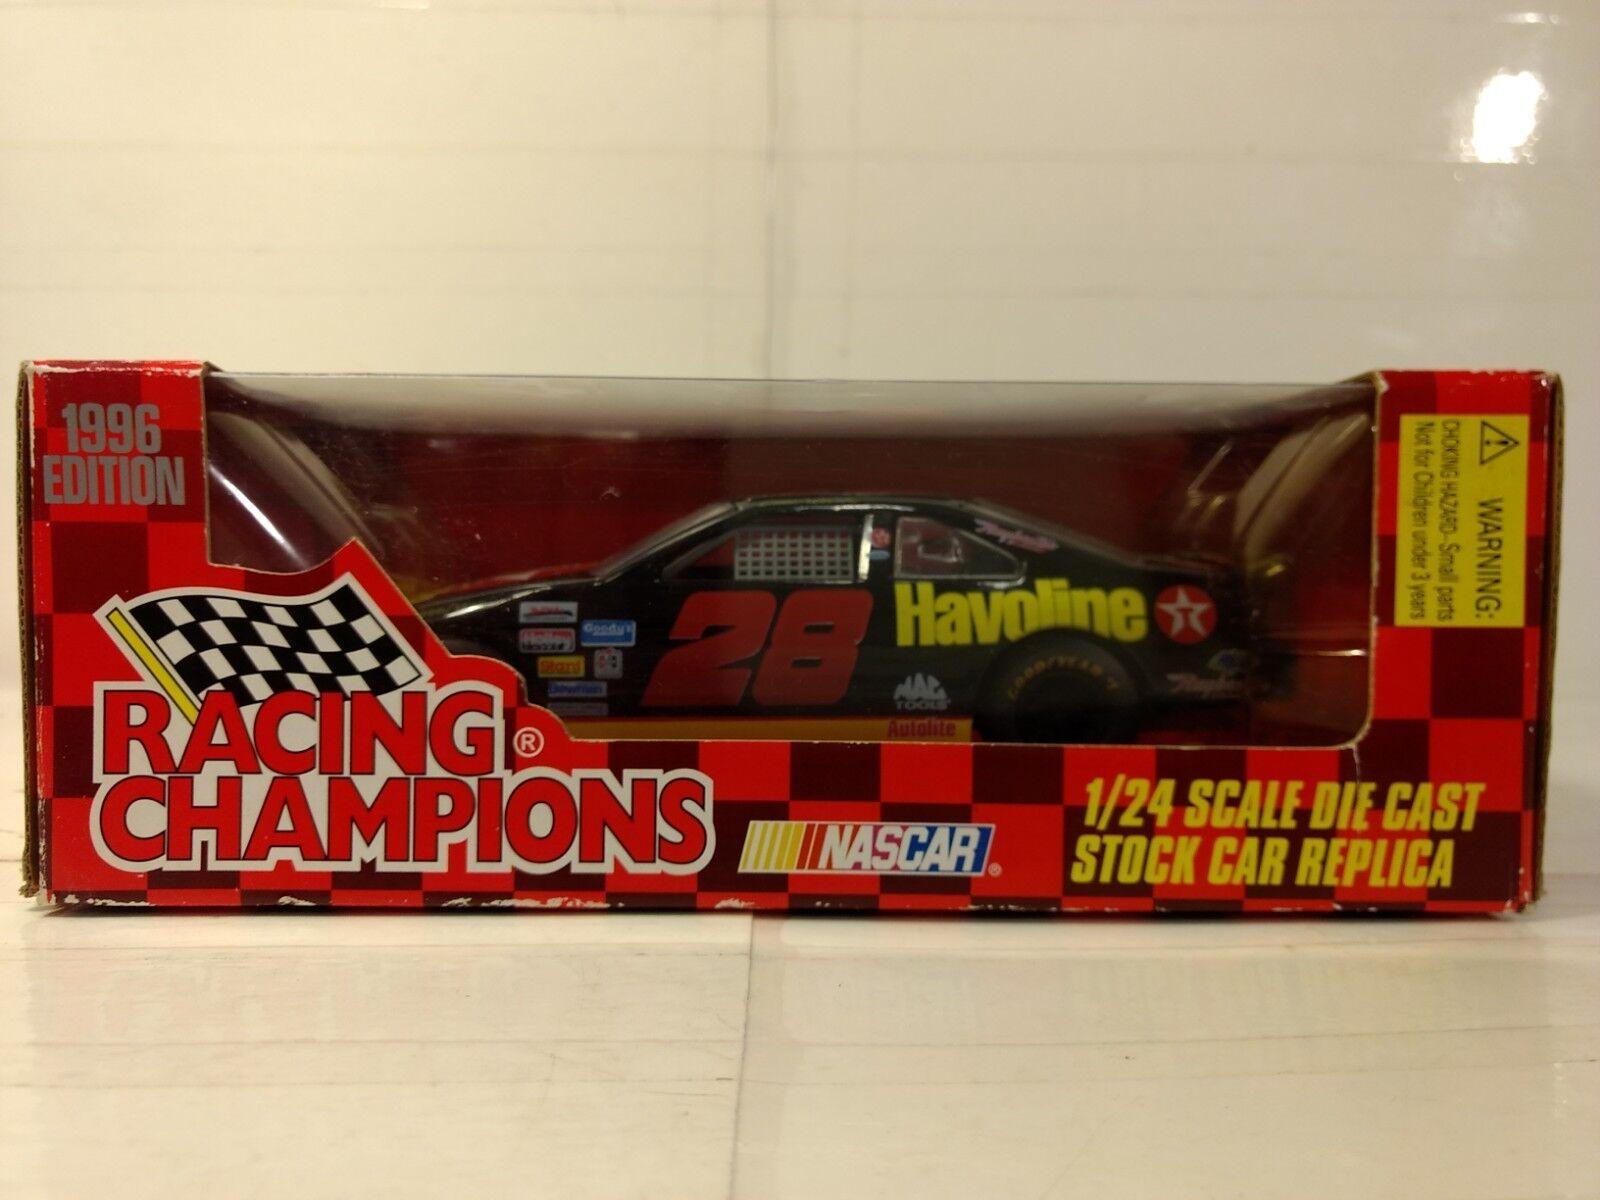 Racing Champions Ernie Irvan Havoline Ford 1 24 Skala-Modelle Neu Dc2283